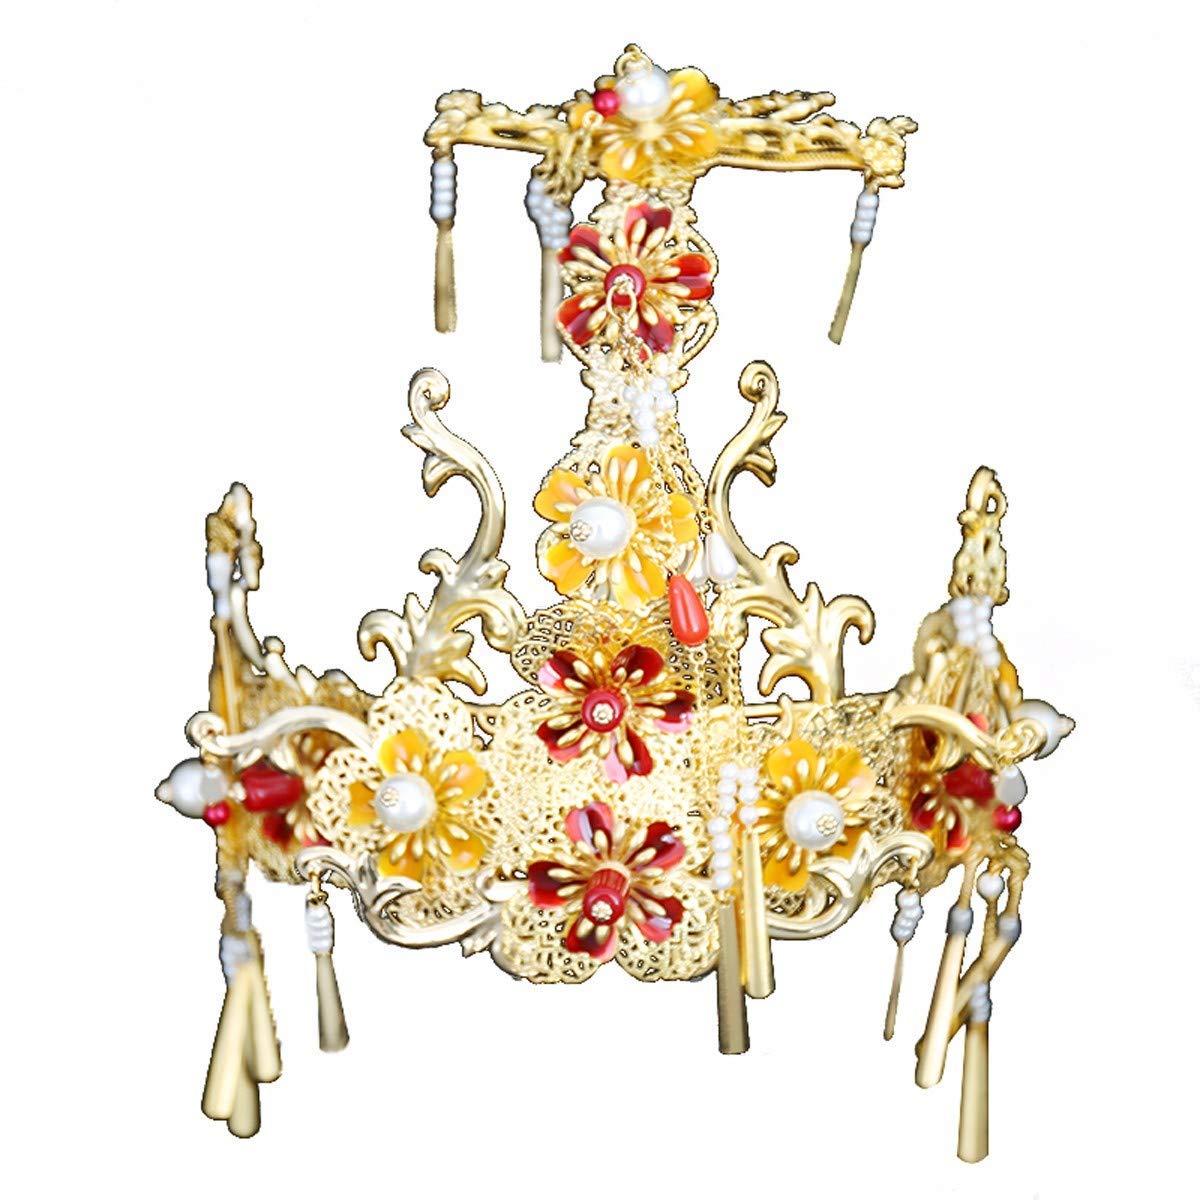 Girls Crown, Beautiful headdress/Bridal Headwear Xiu Wo Ancient Costume Accessories Set Chinese Retro Style Phoenix Crown Show Dress And Wedding Accessories.